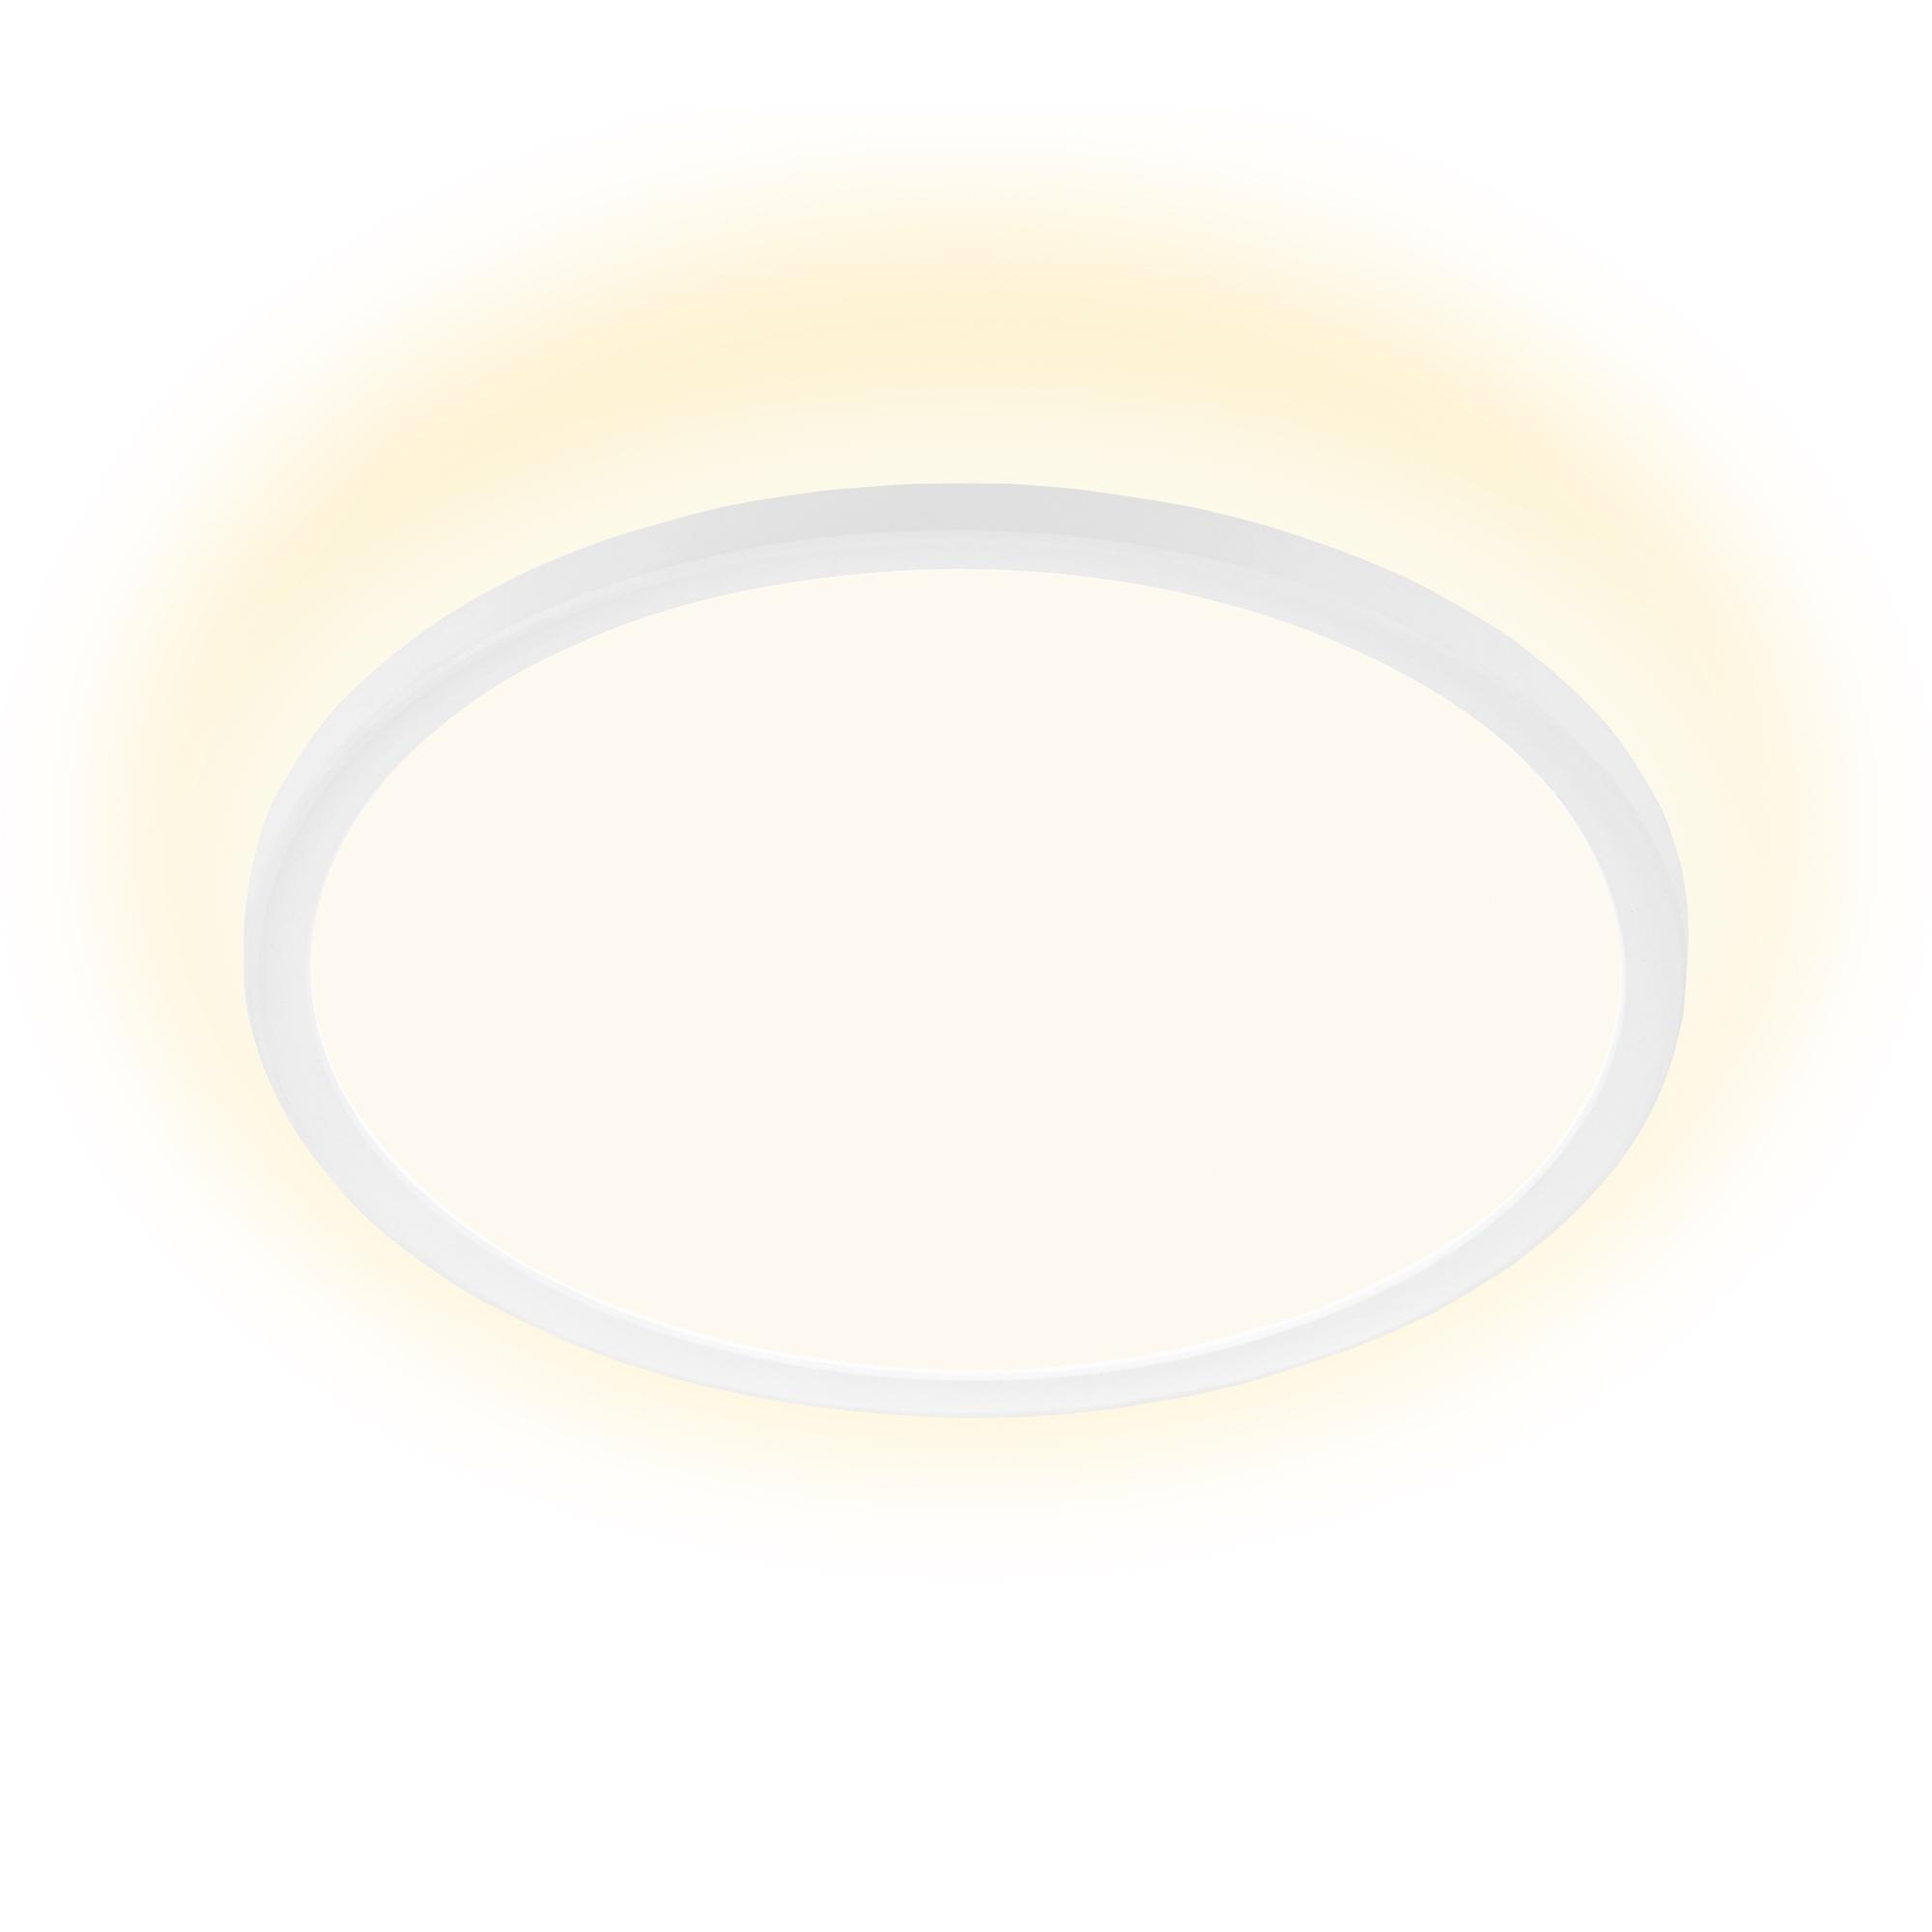 SLIM LED Panel, Ø 29,3cm, 2400 LUMEN, 18 WATT, Weiss